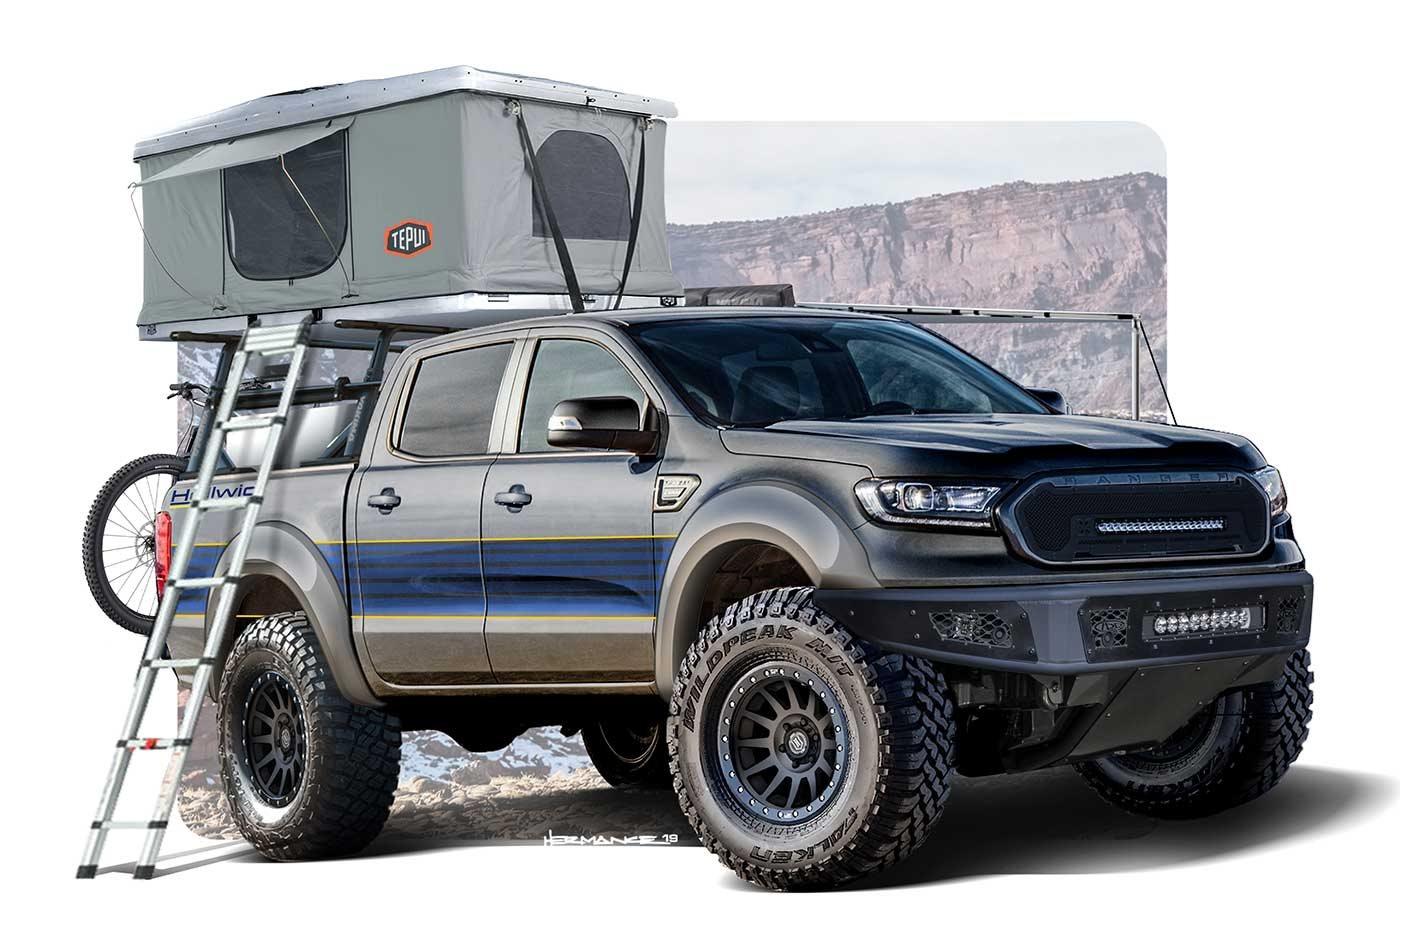 Six Ford Ranger customs ready for SEMA Show